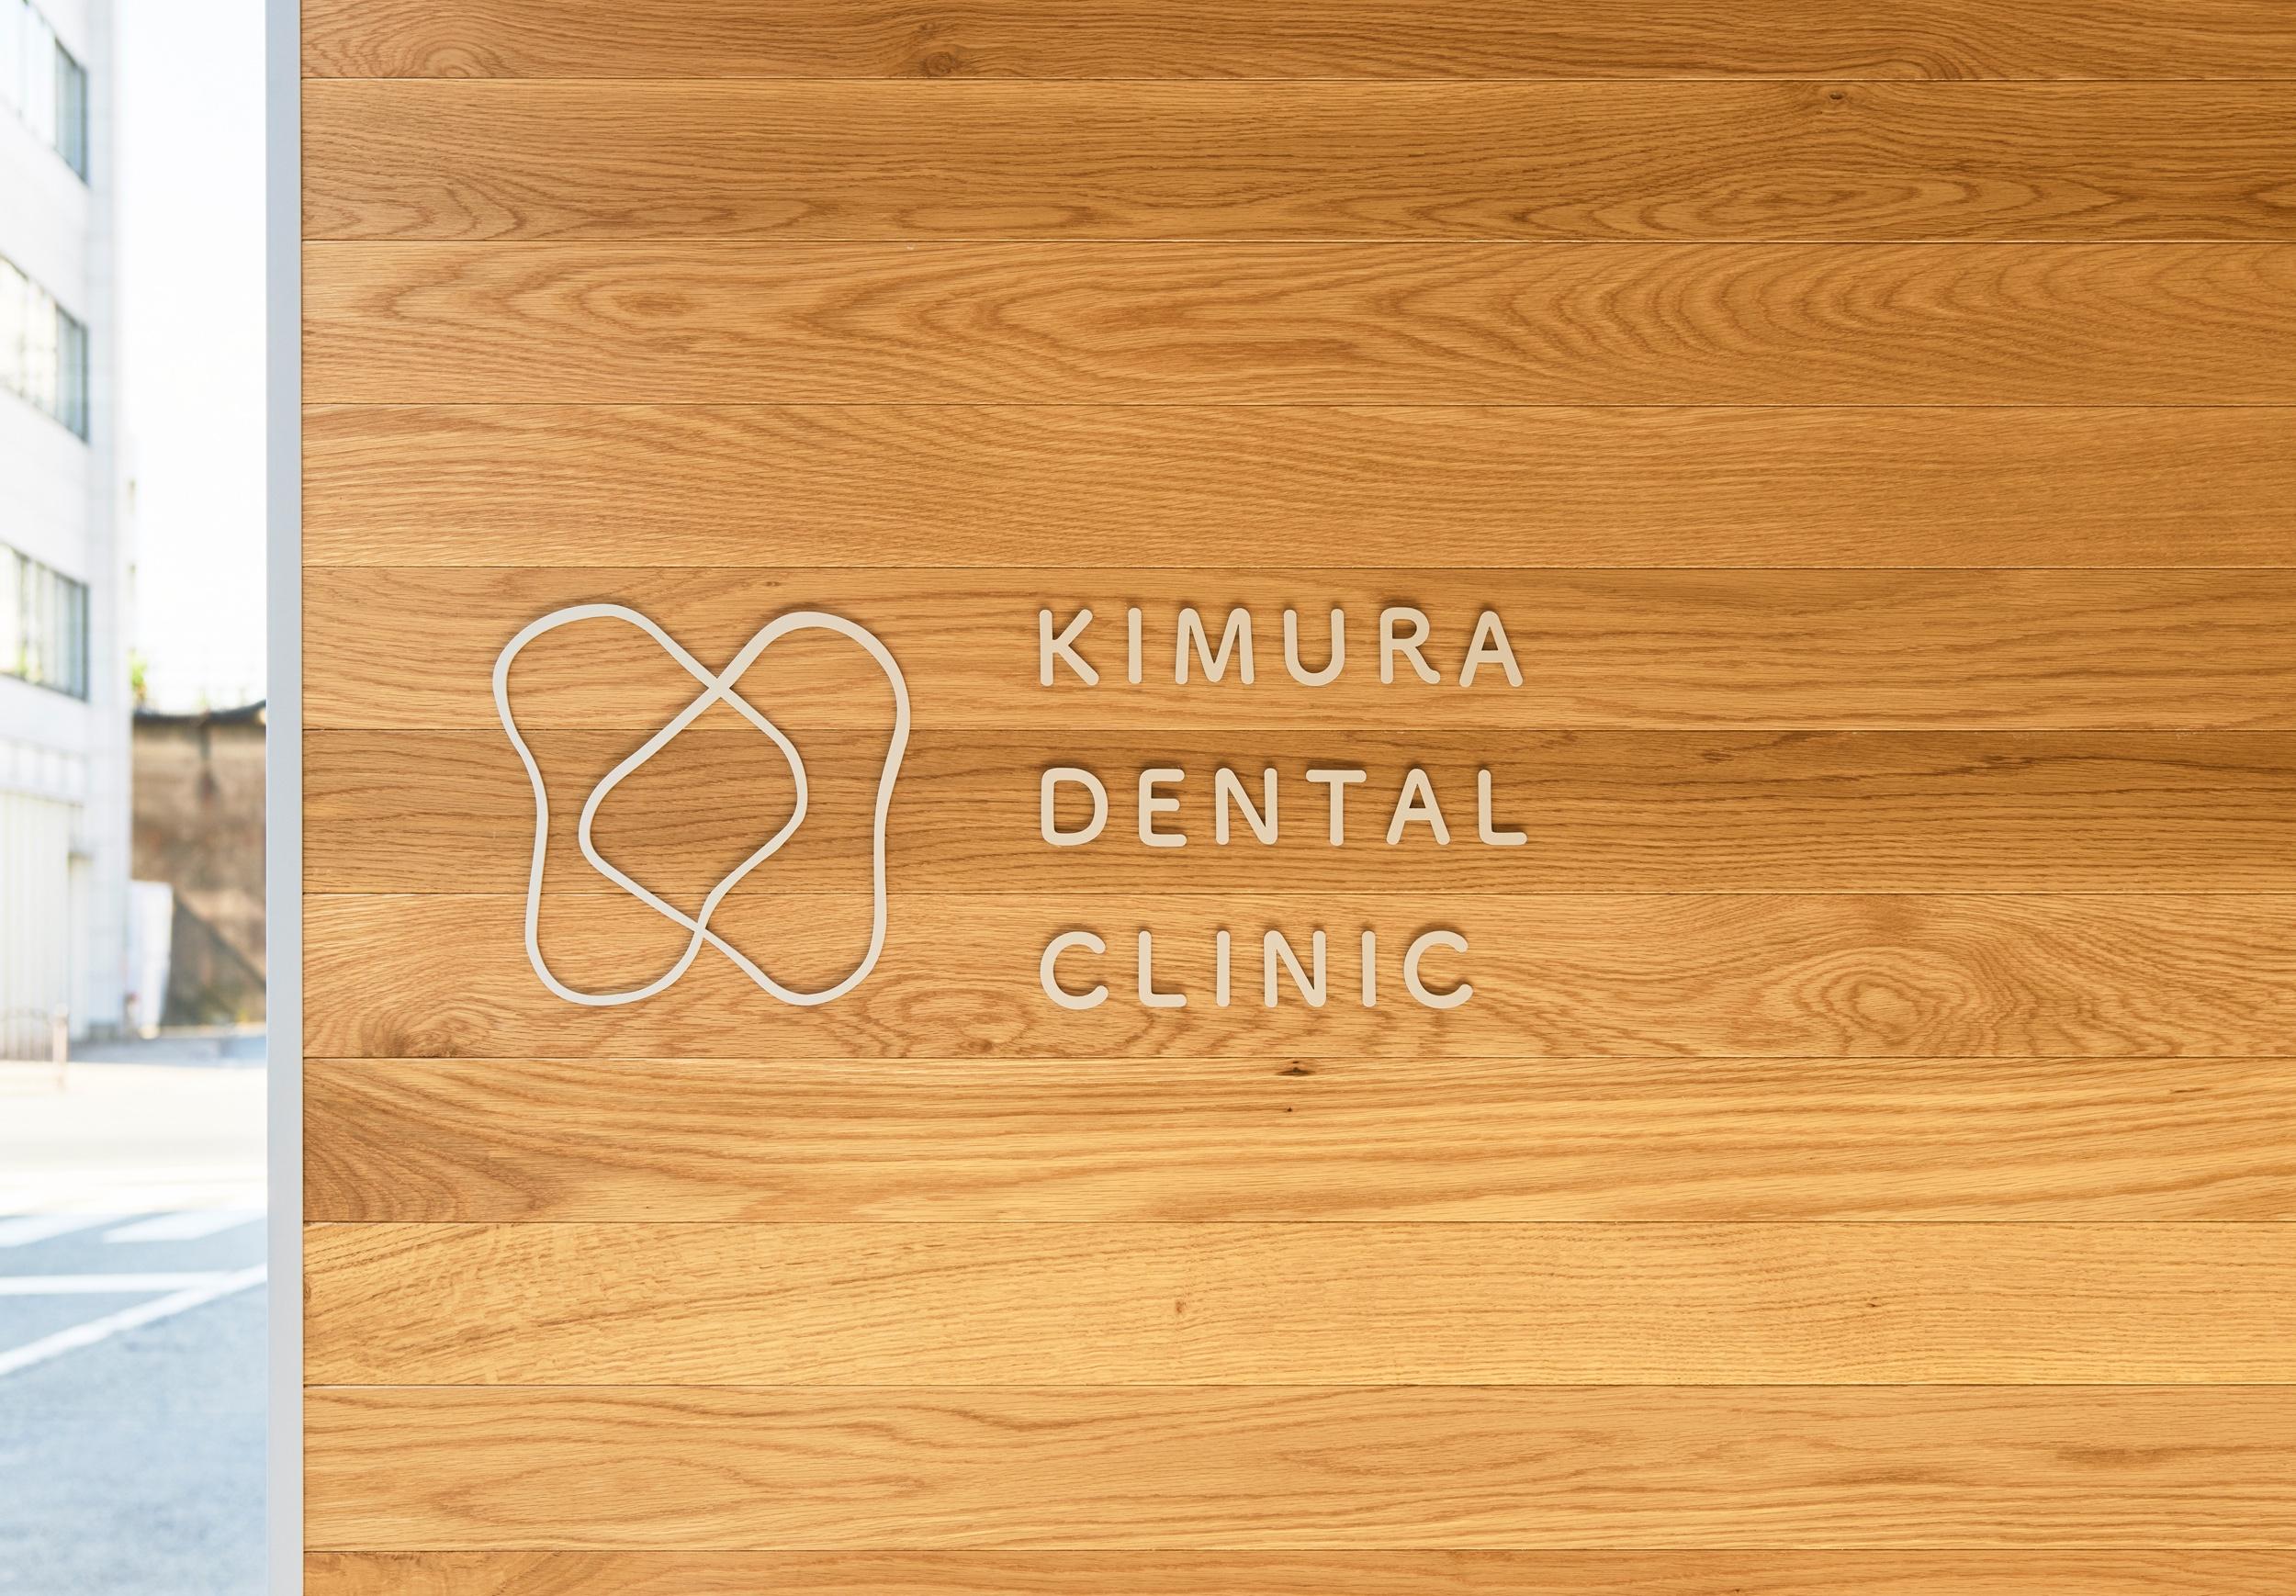 Kimura Dental Clinic 09s ©Takeshi Asano 2019